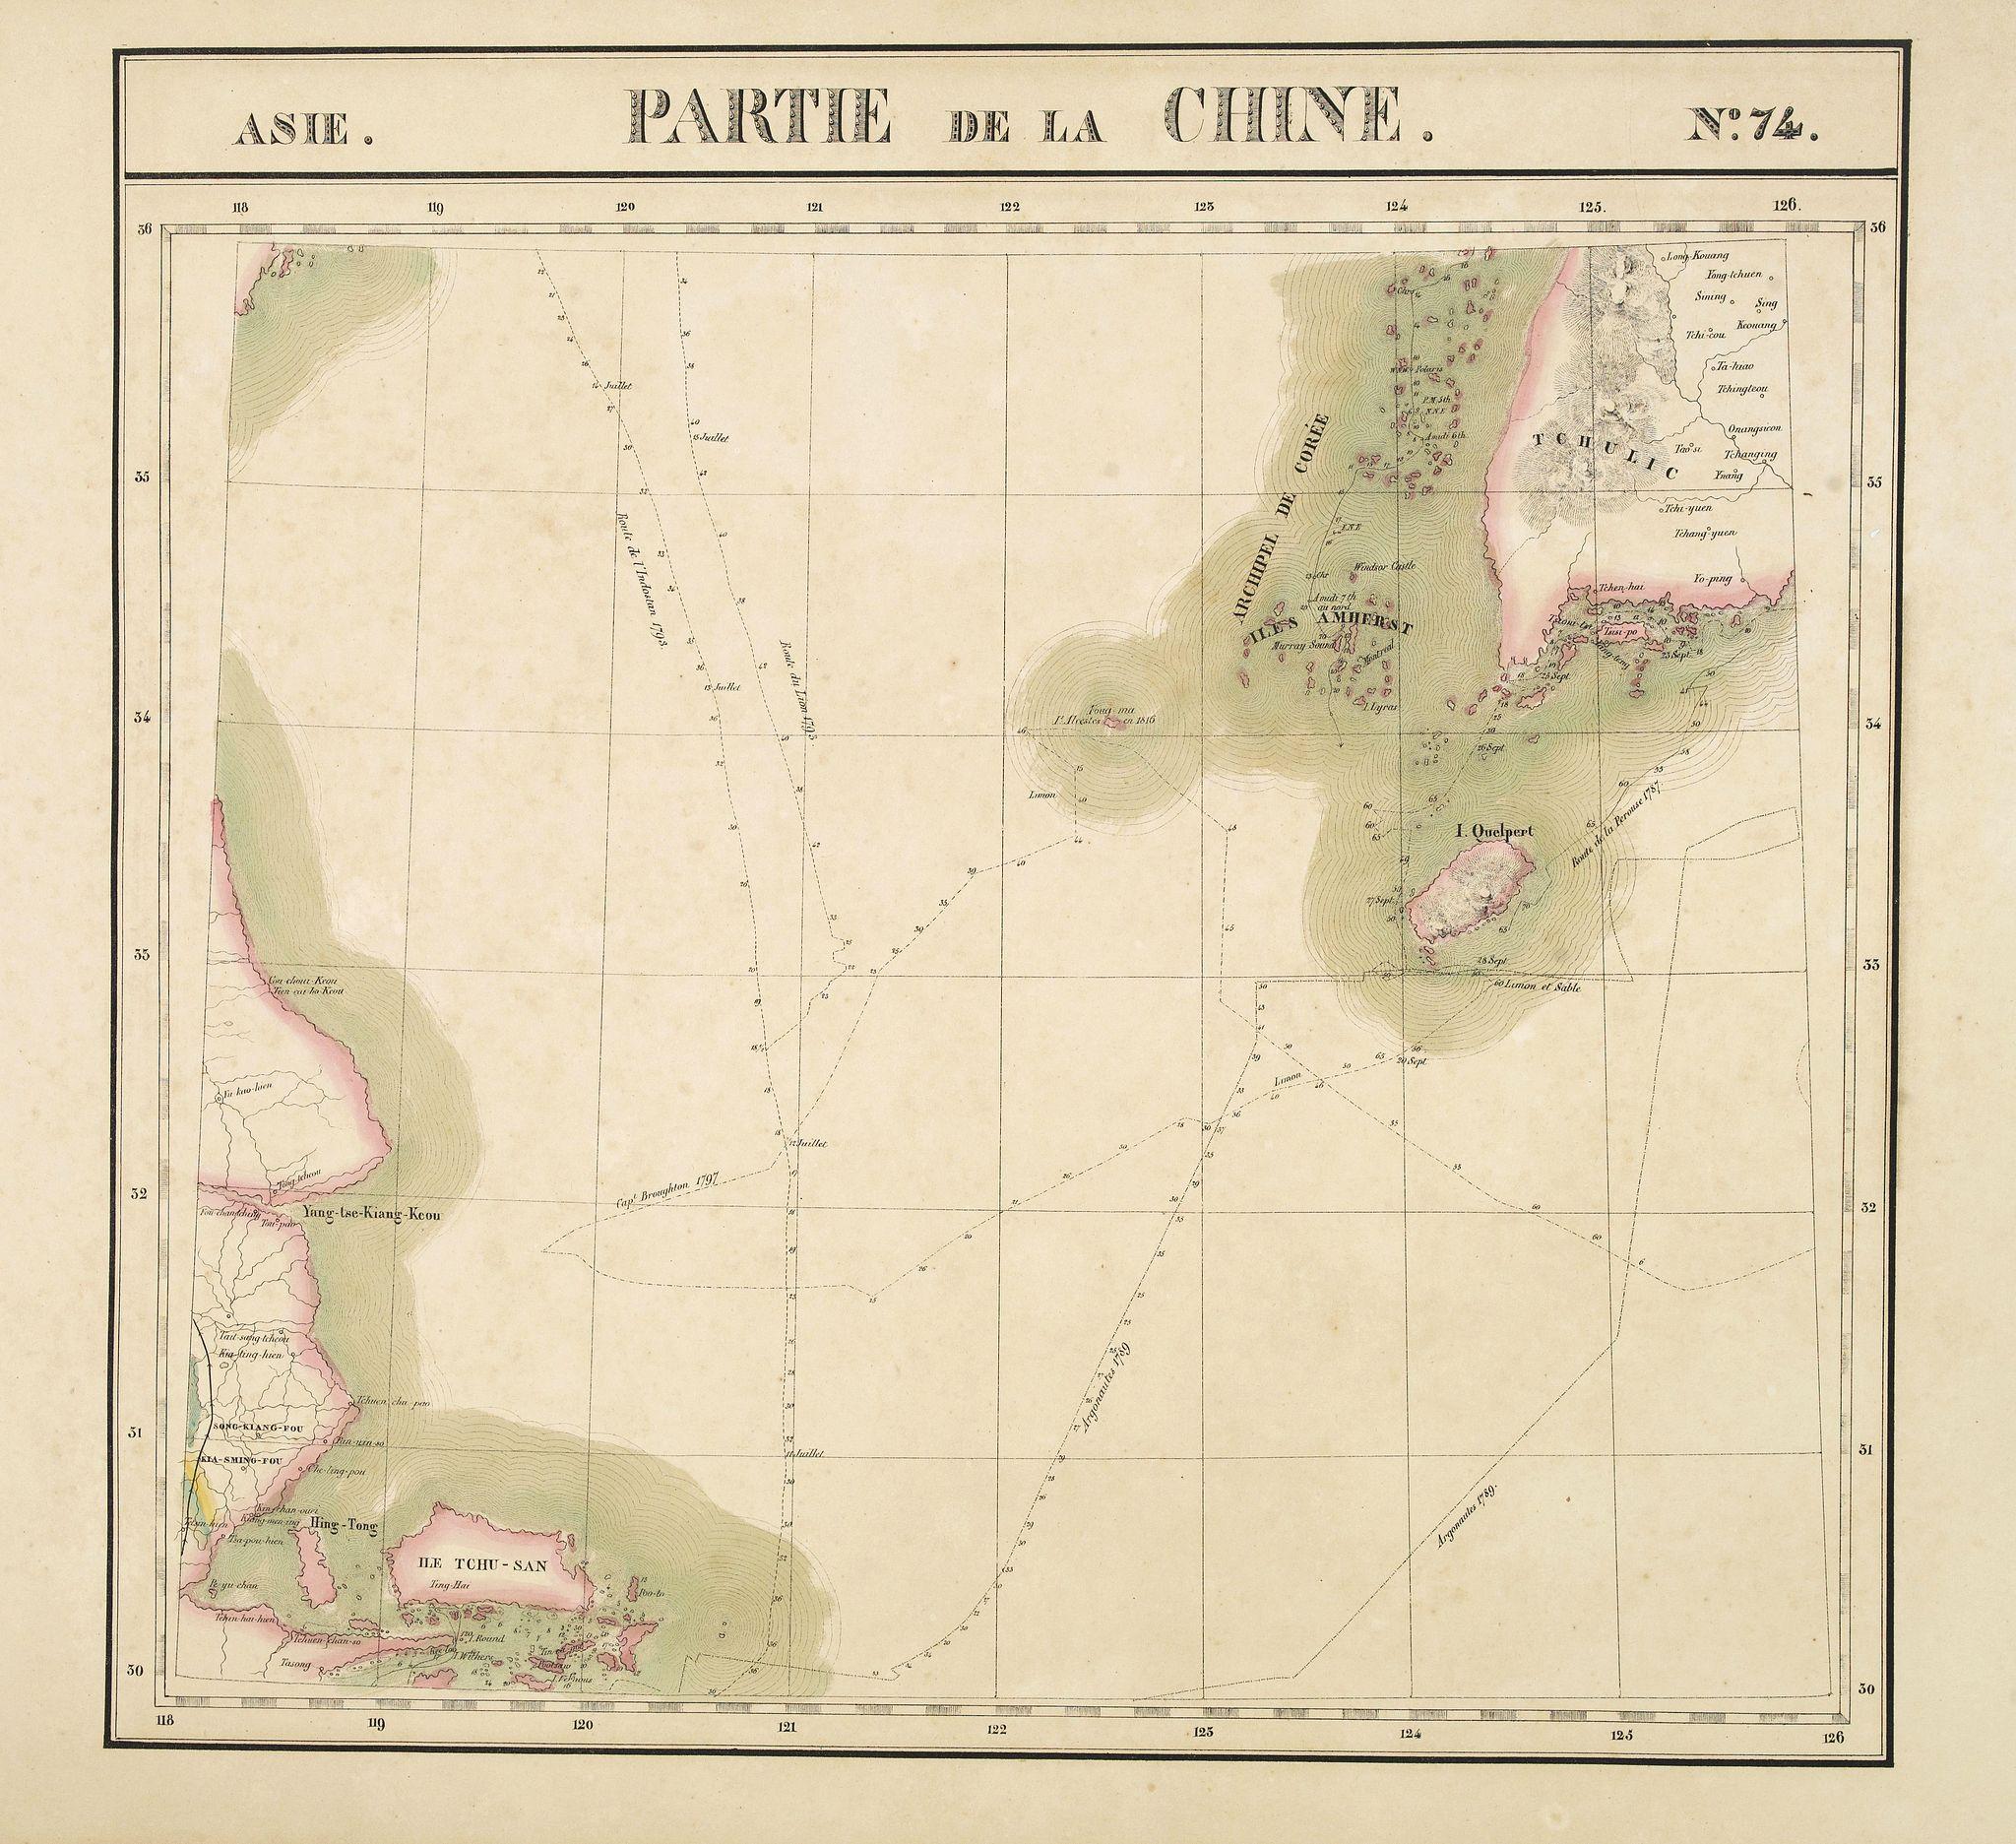 VANDERMAELEN, Ph. -  Partie de la Chine. N°.74 (Including South Korea)